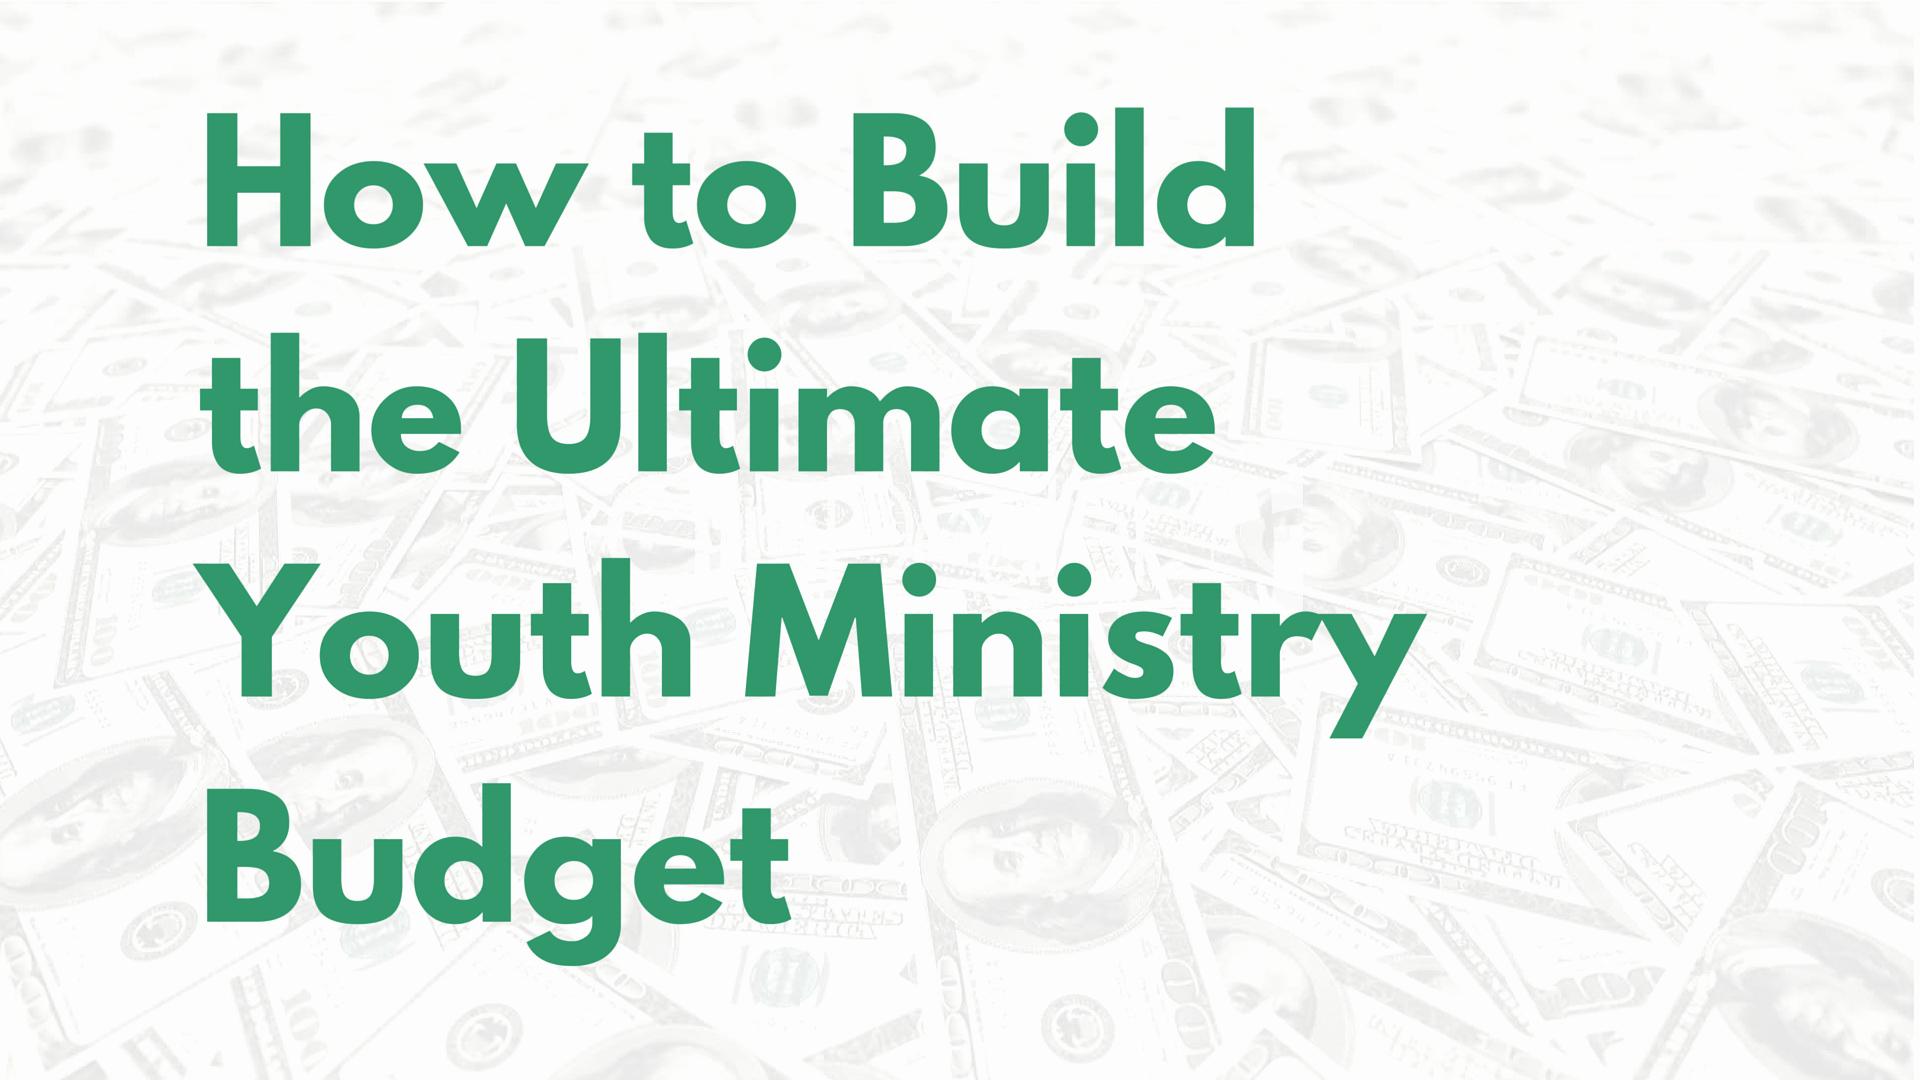 Church Ministry Budget Template Luxury Church Bud Percentage Template Youth Ministry Bud